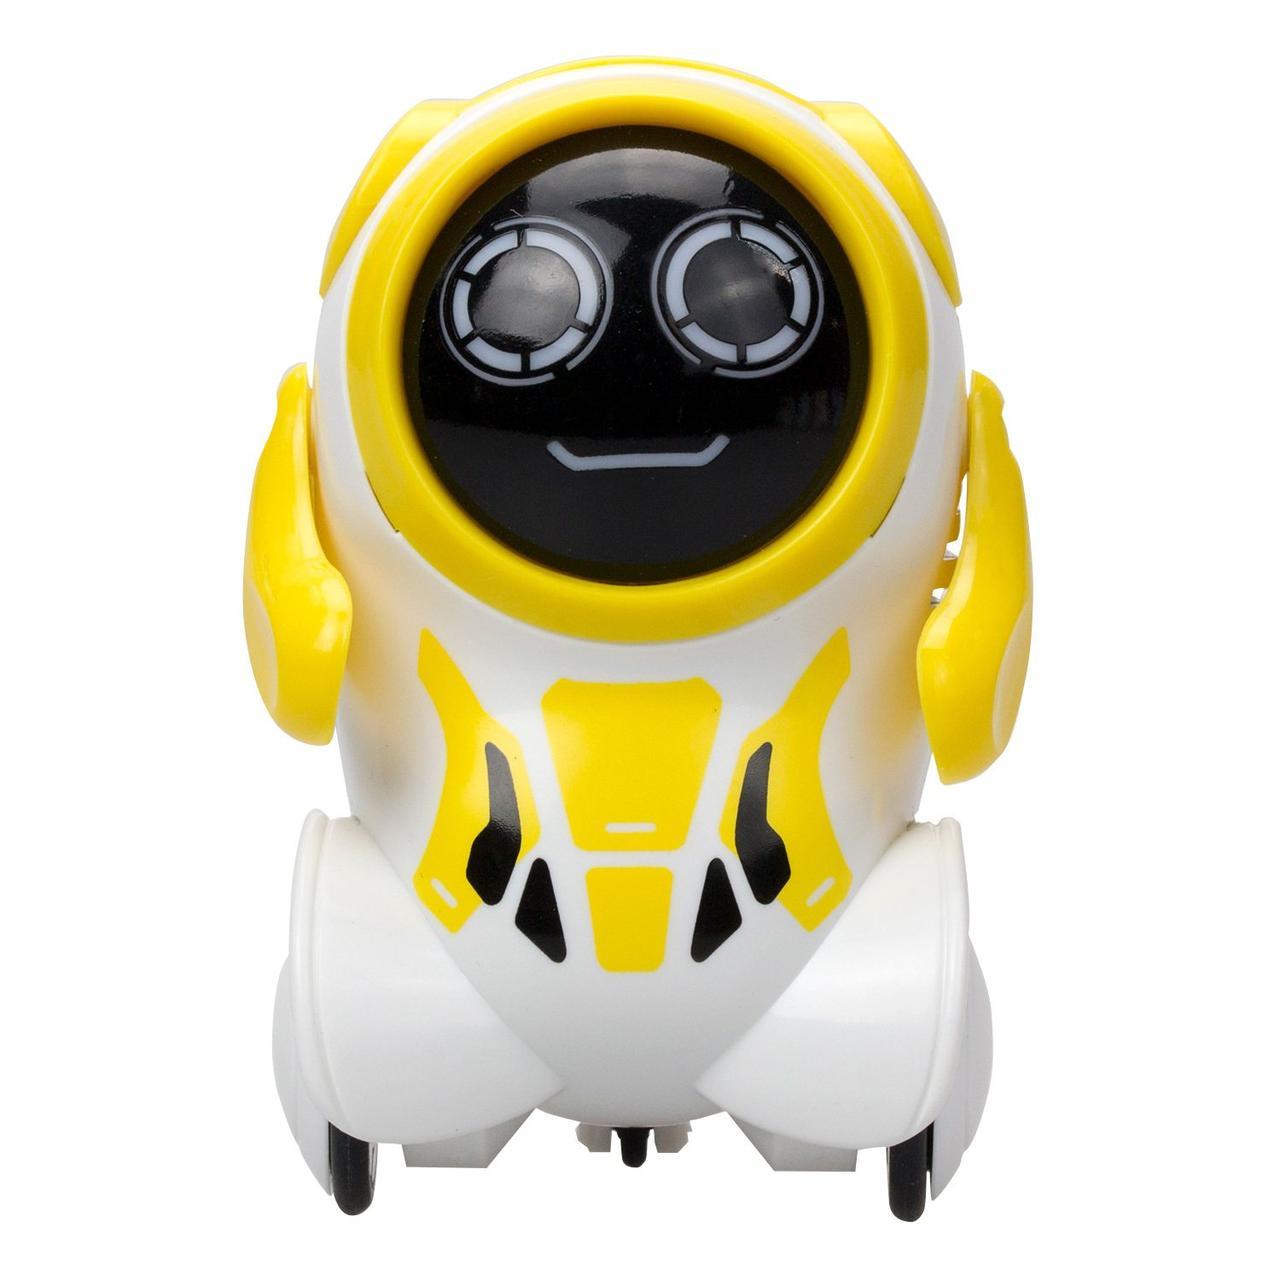 Silverlit Робот Покибот (Pokibot) - желтый круглый